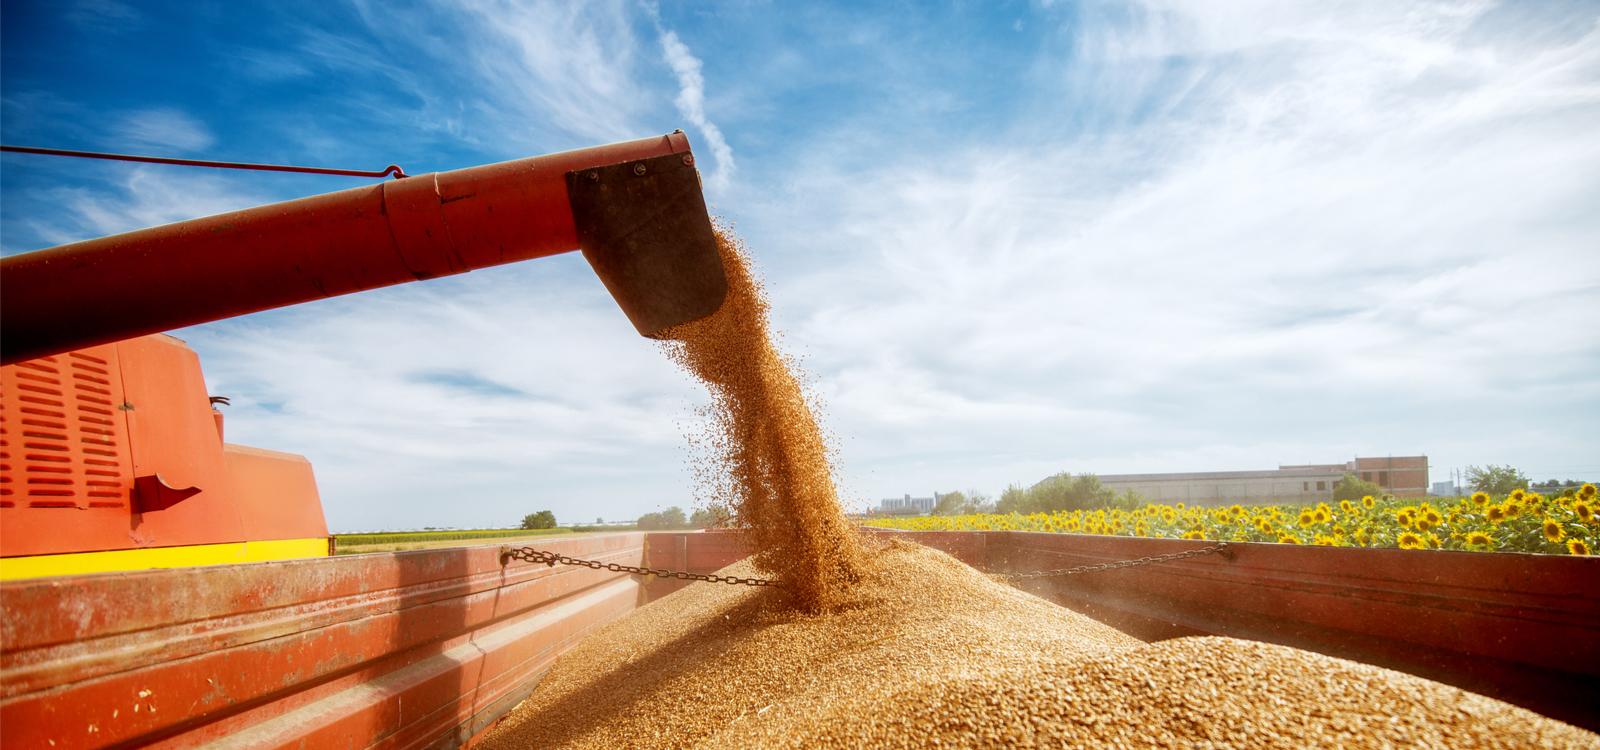 Grains: Still the portfolio diversifier of champions